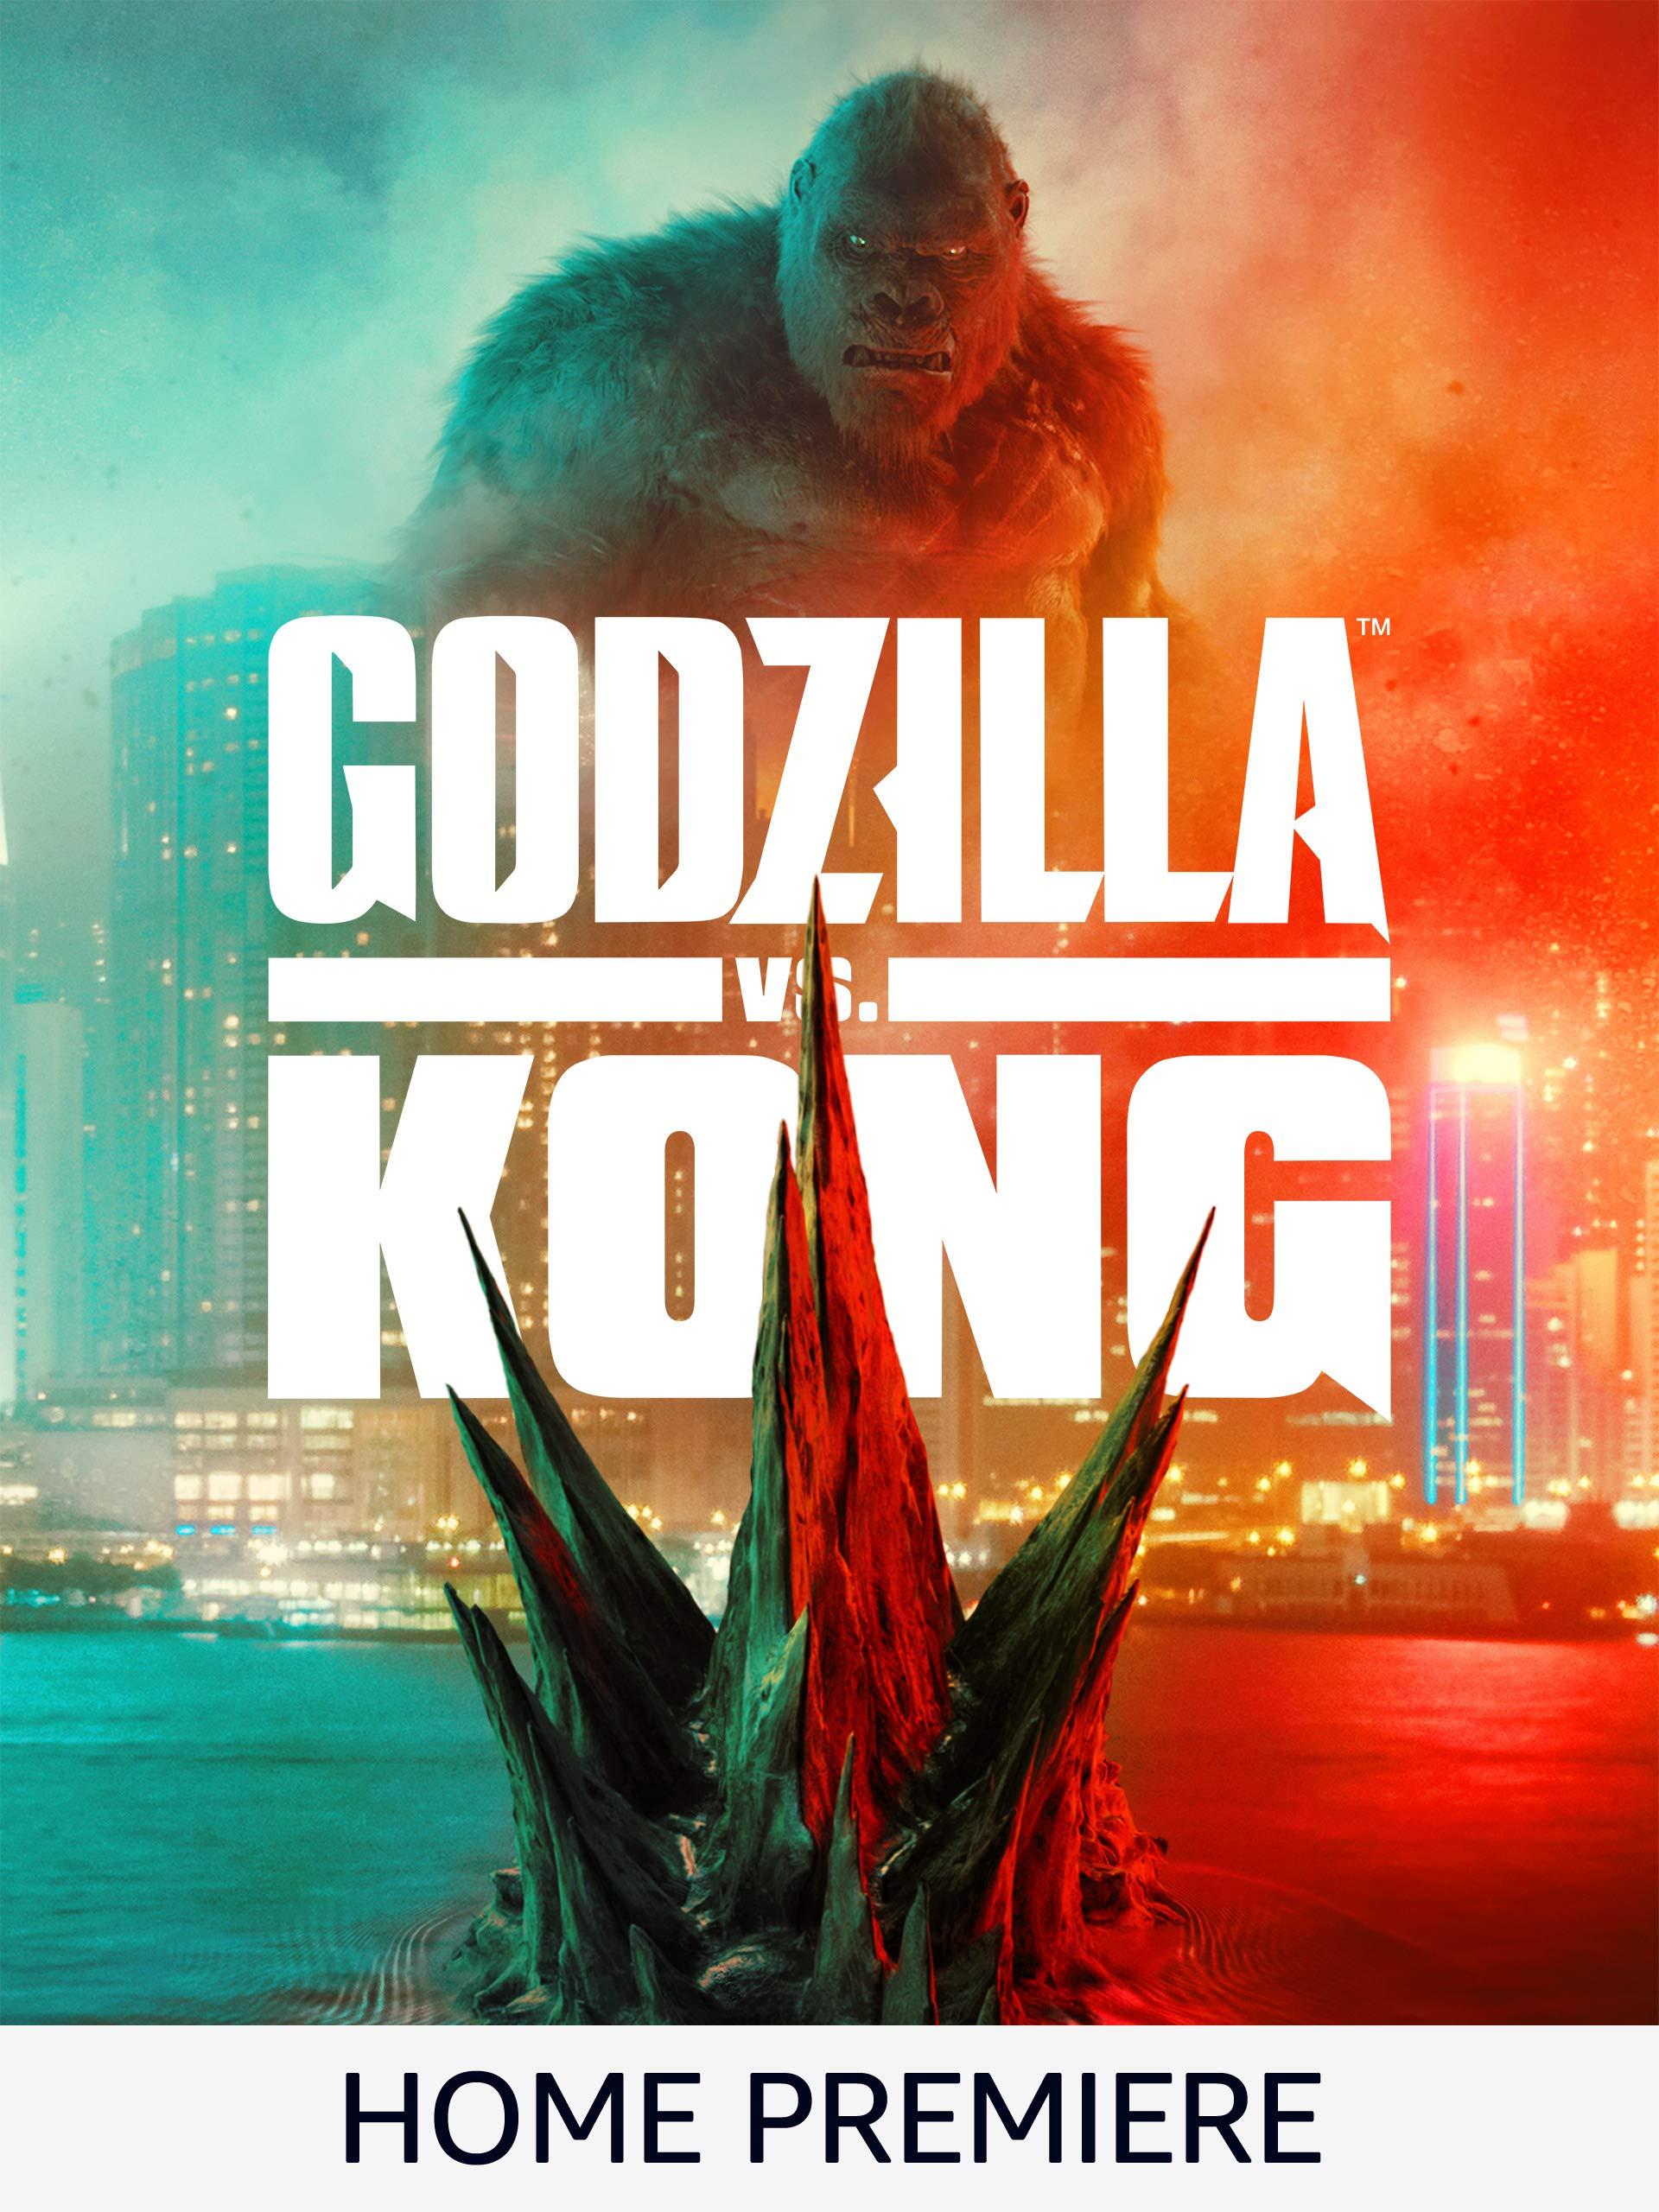 Watch Godzilla Vs Kong 4k Uhd Prime Video